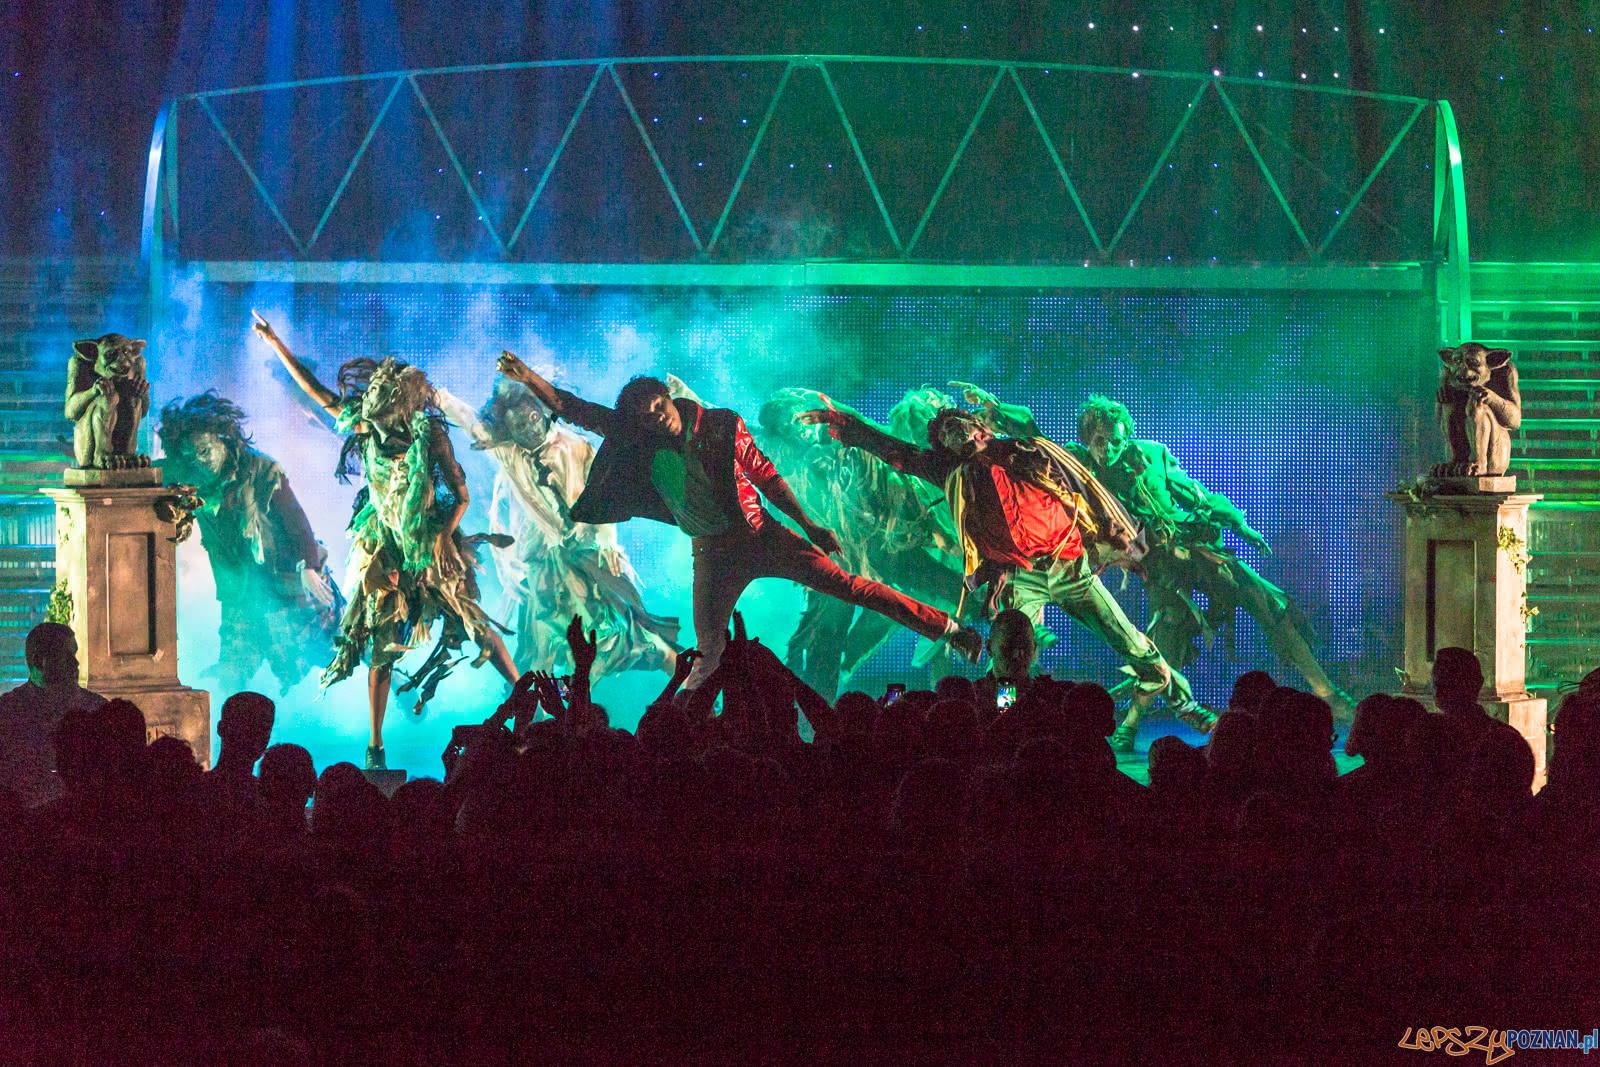 Thriller Live  Foto: lepszyPOZNAN.pl/Piotr Rychter